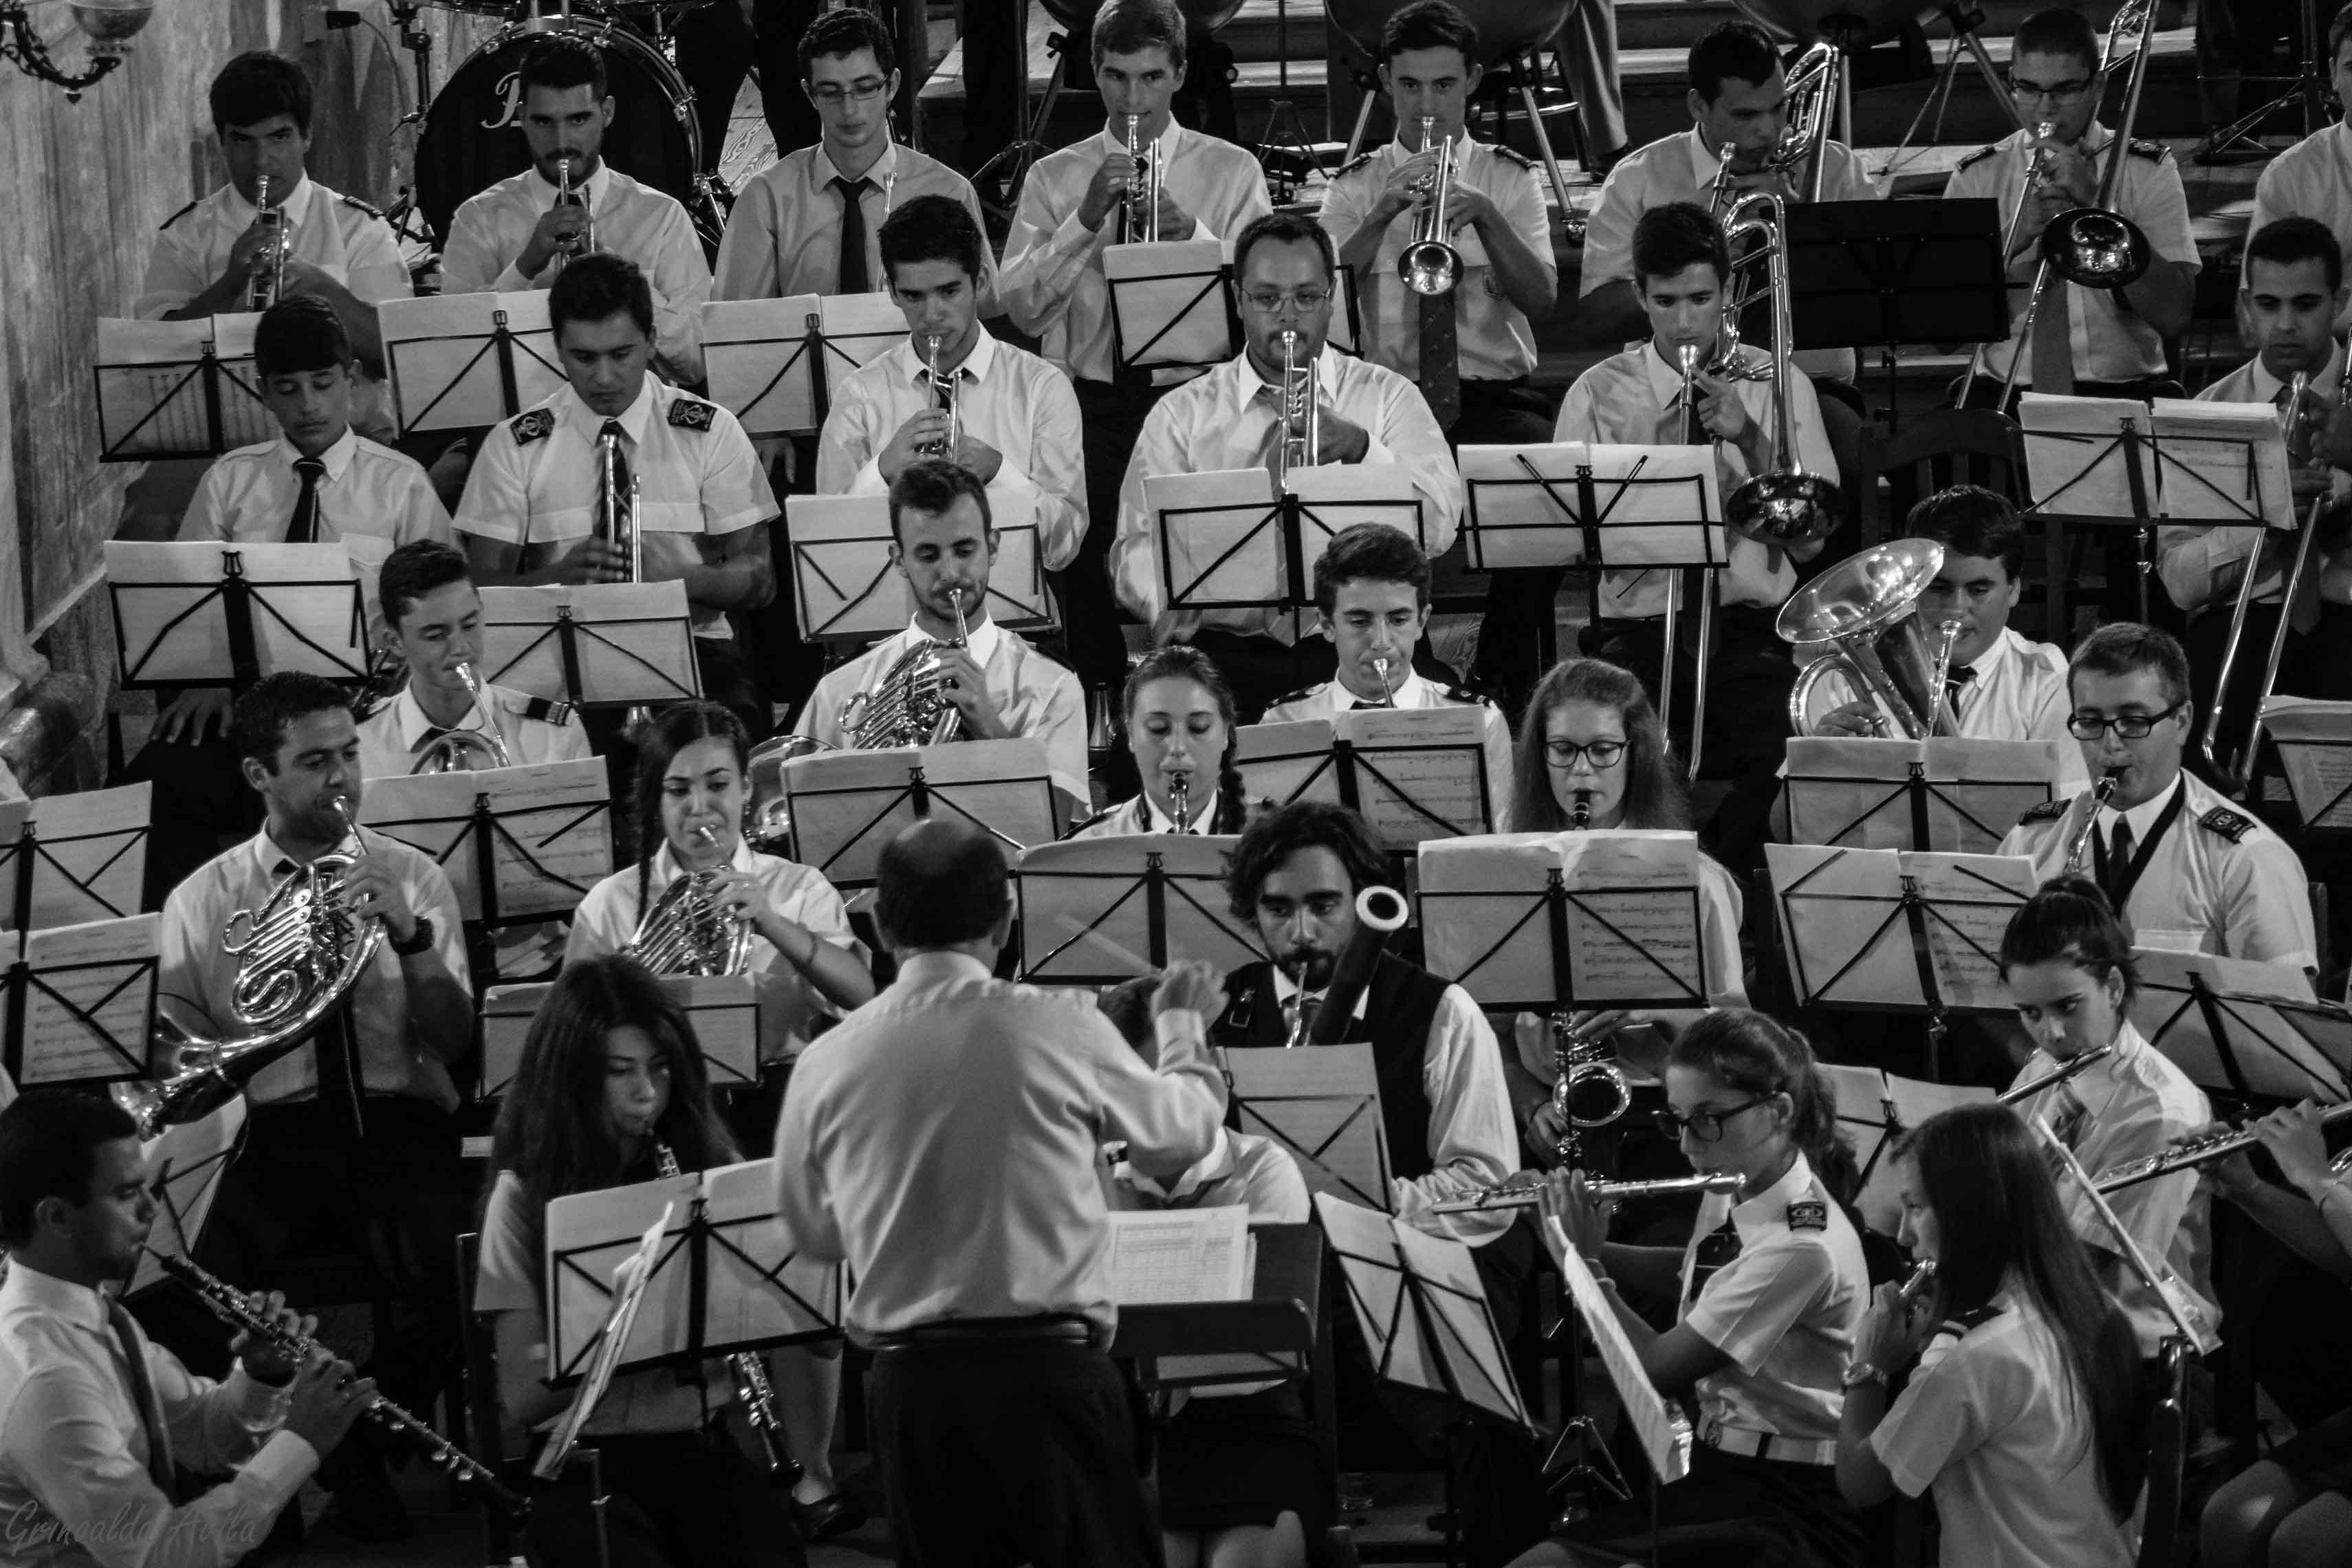 Lira Açoriana realiza estágio e concerto no Teatro Micaelense